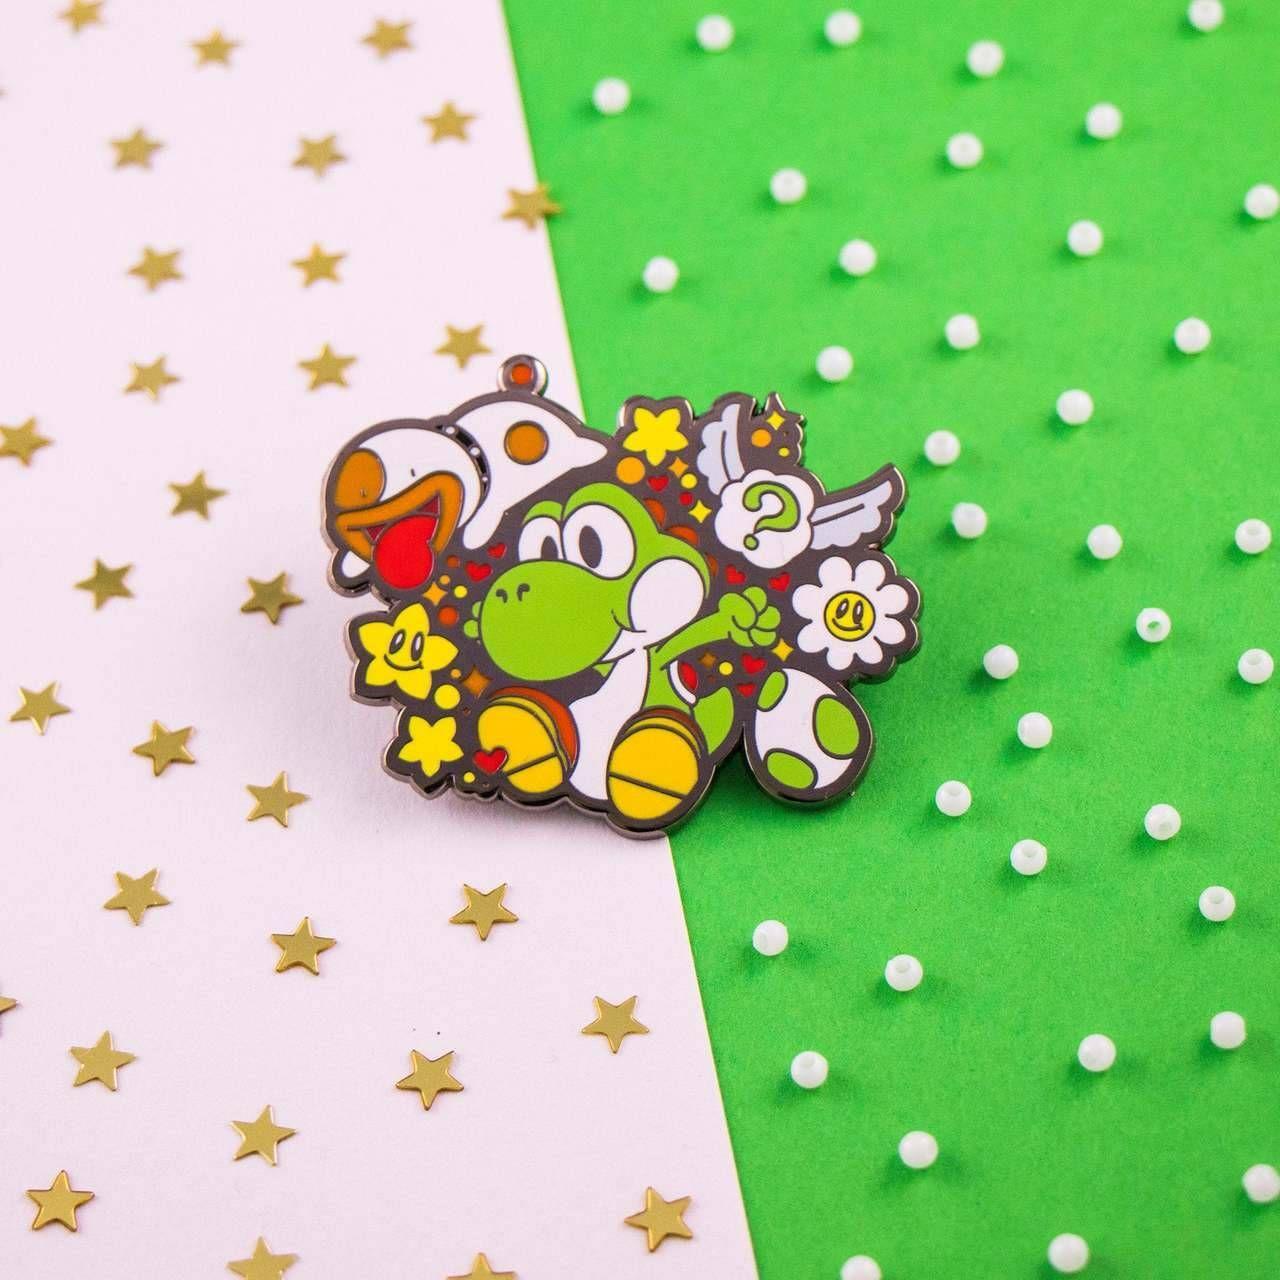 Yoshi & Poochy PIns made by ArtRox -